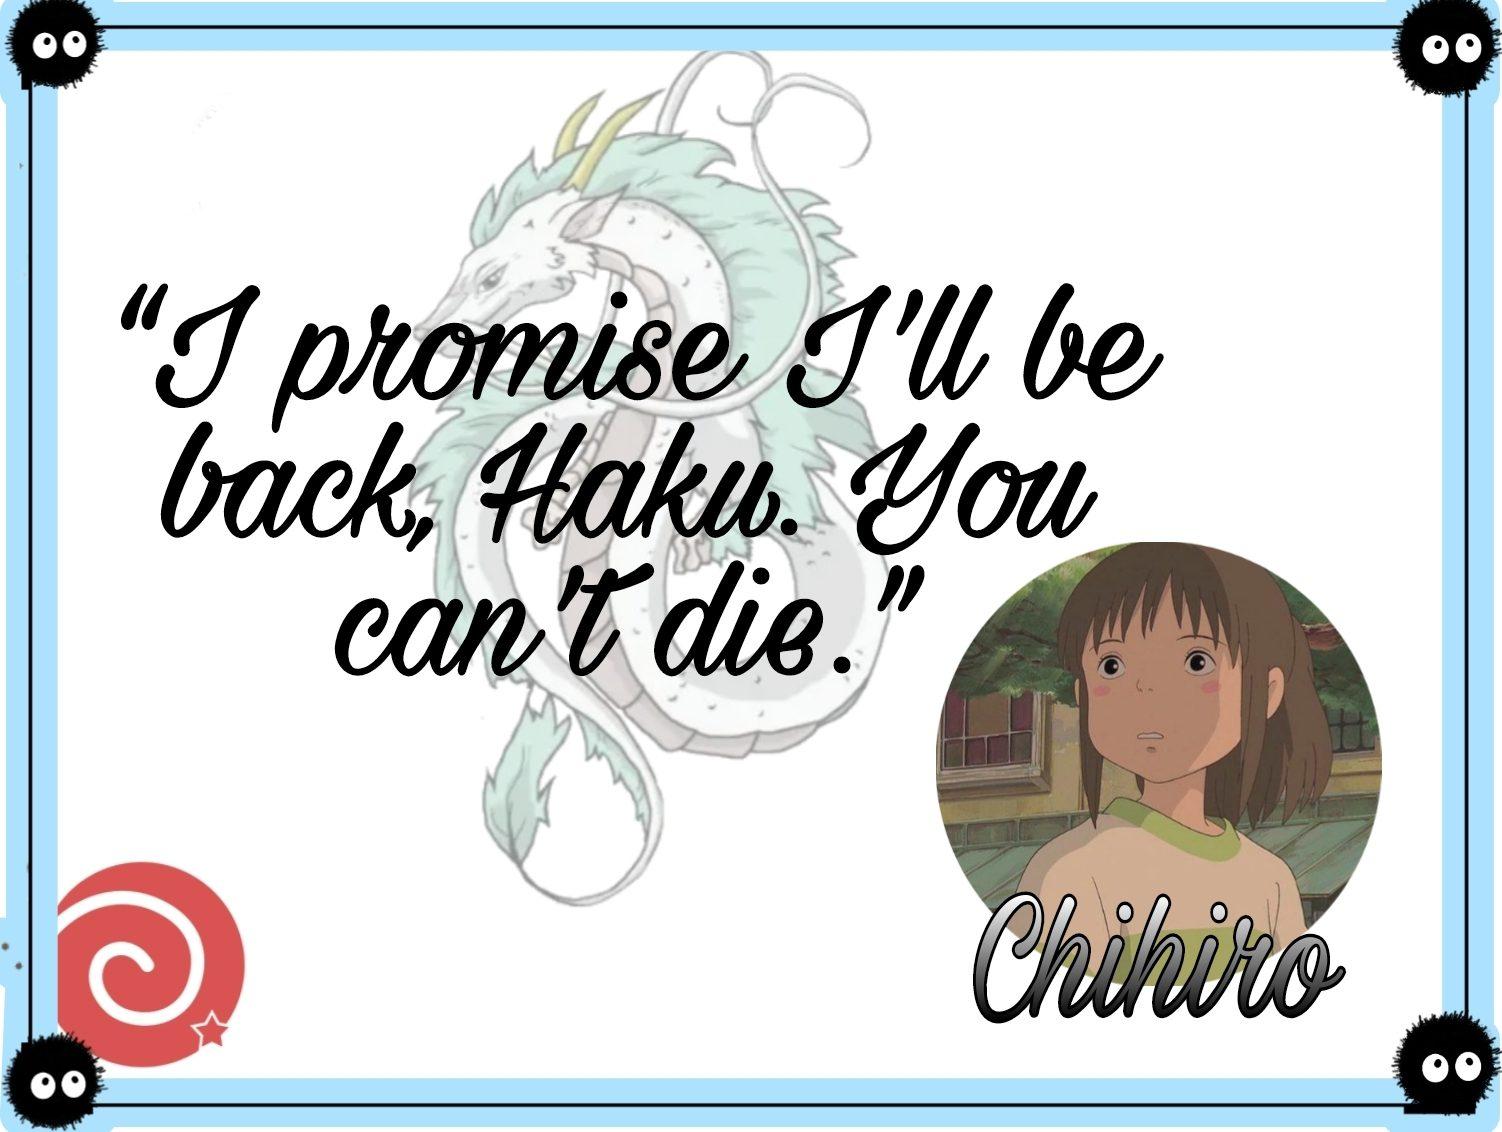 Chihiro quotes from Spirited Away